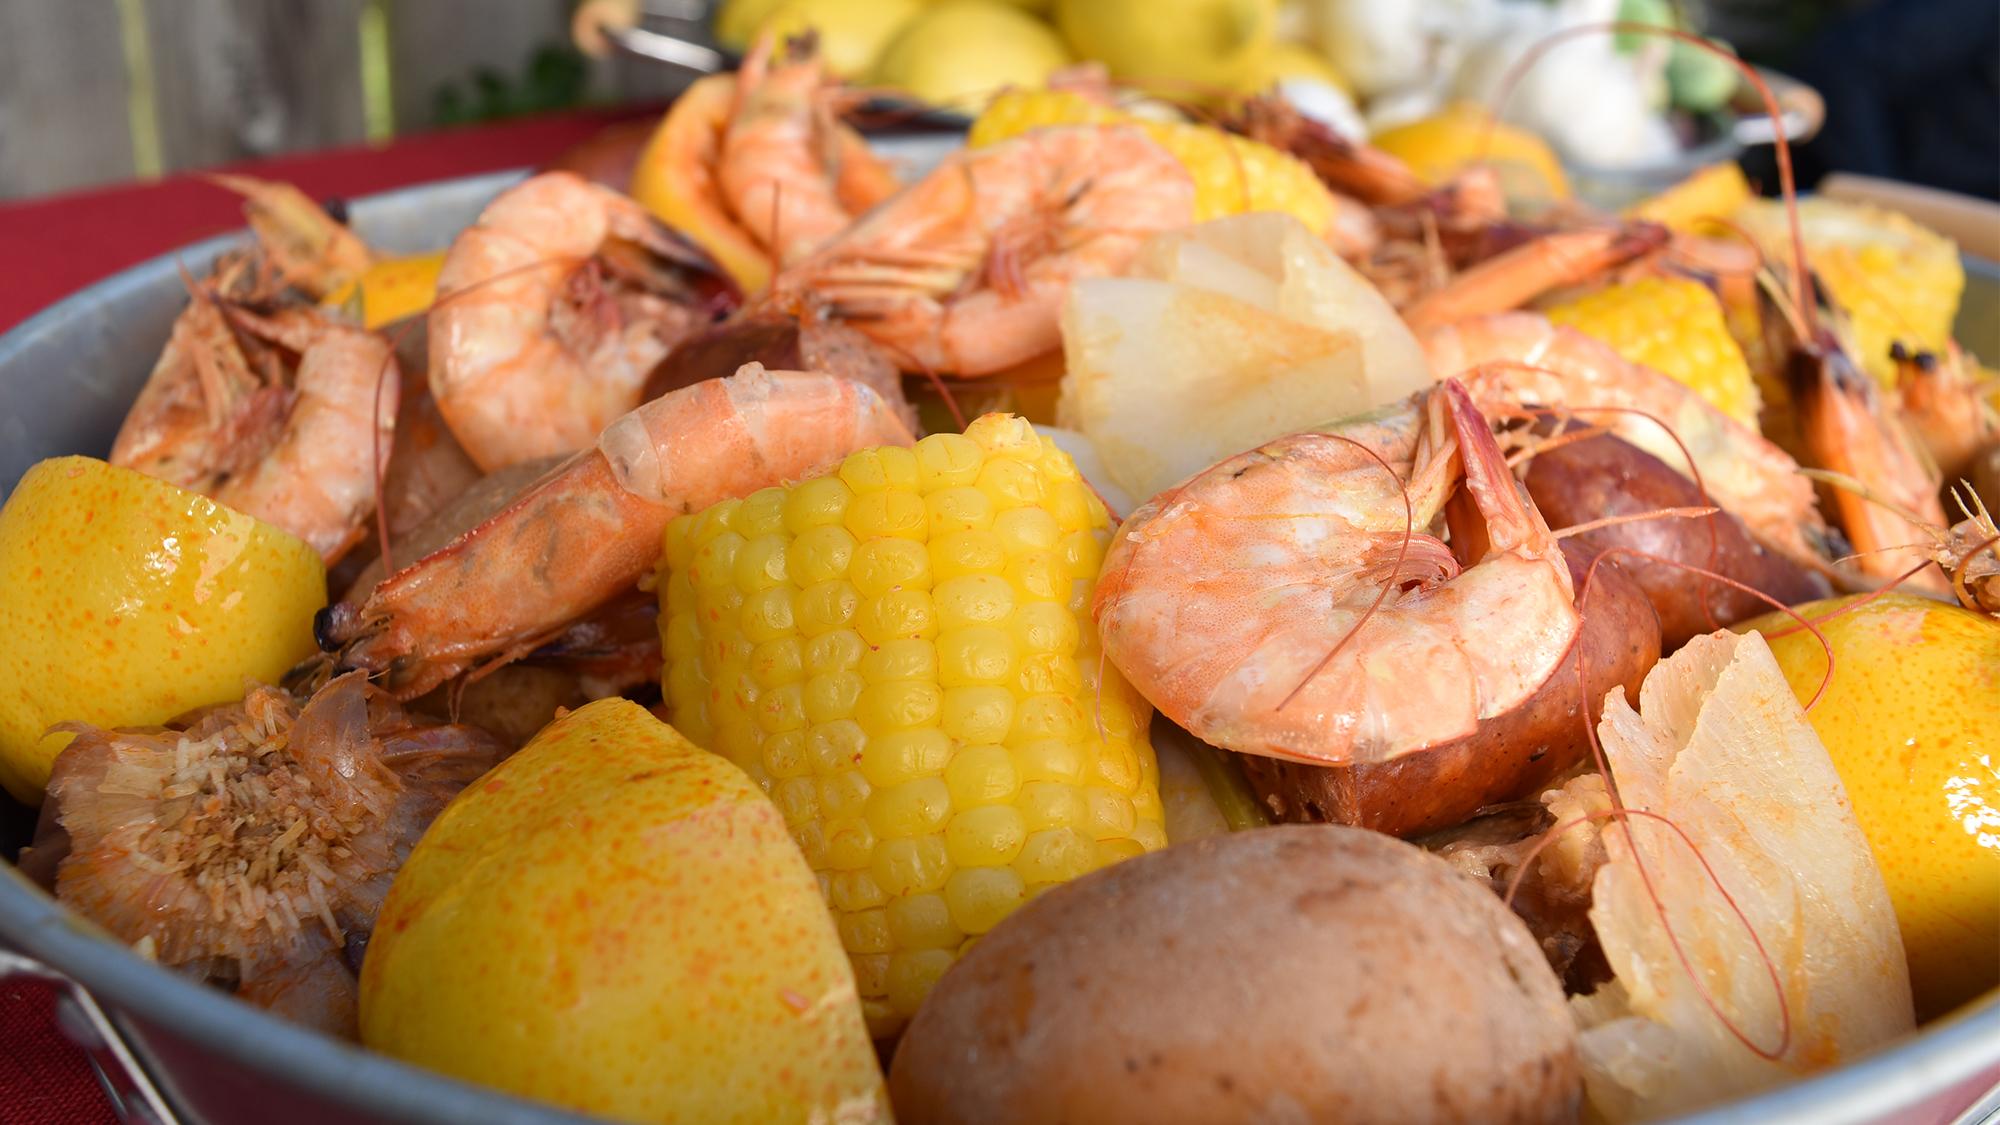 ZATA_6633_website-recipe_ShrimpBoil_2000x1125.jpg